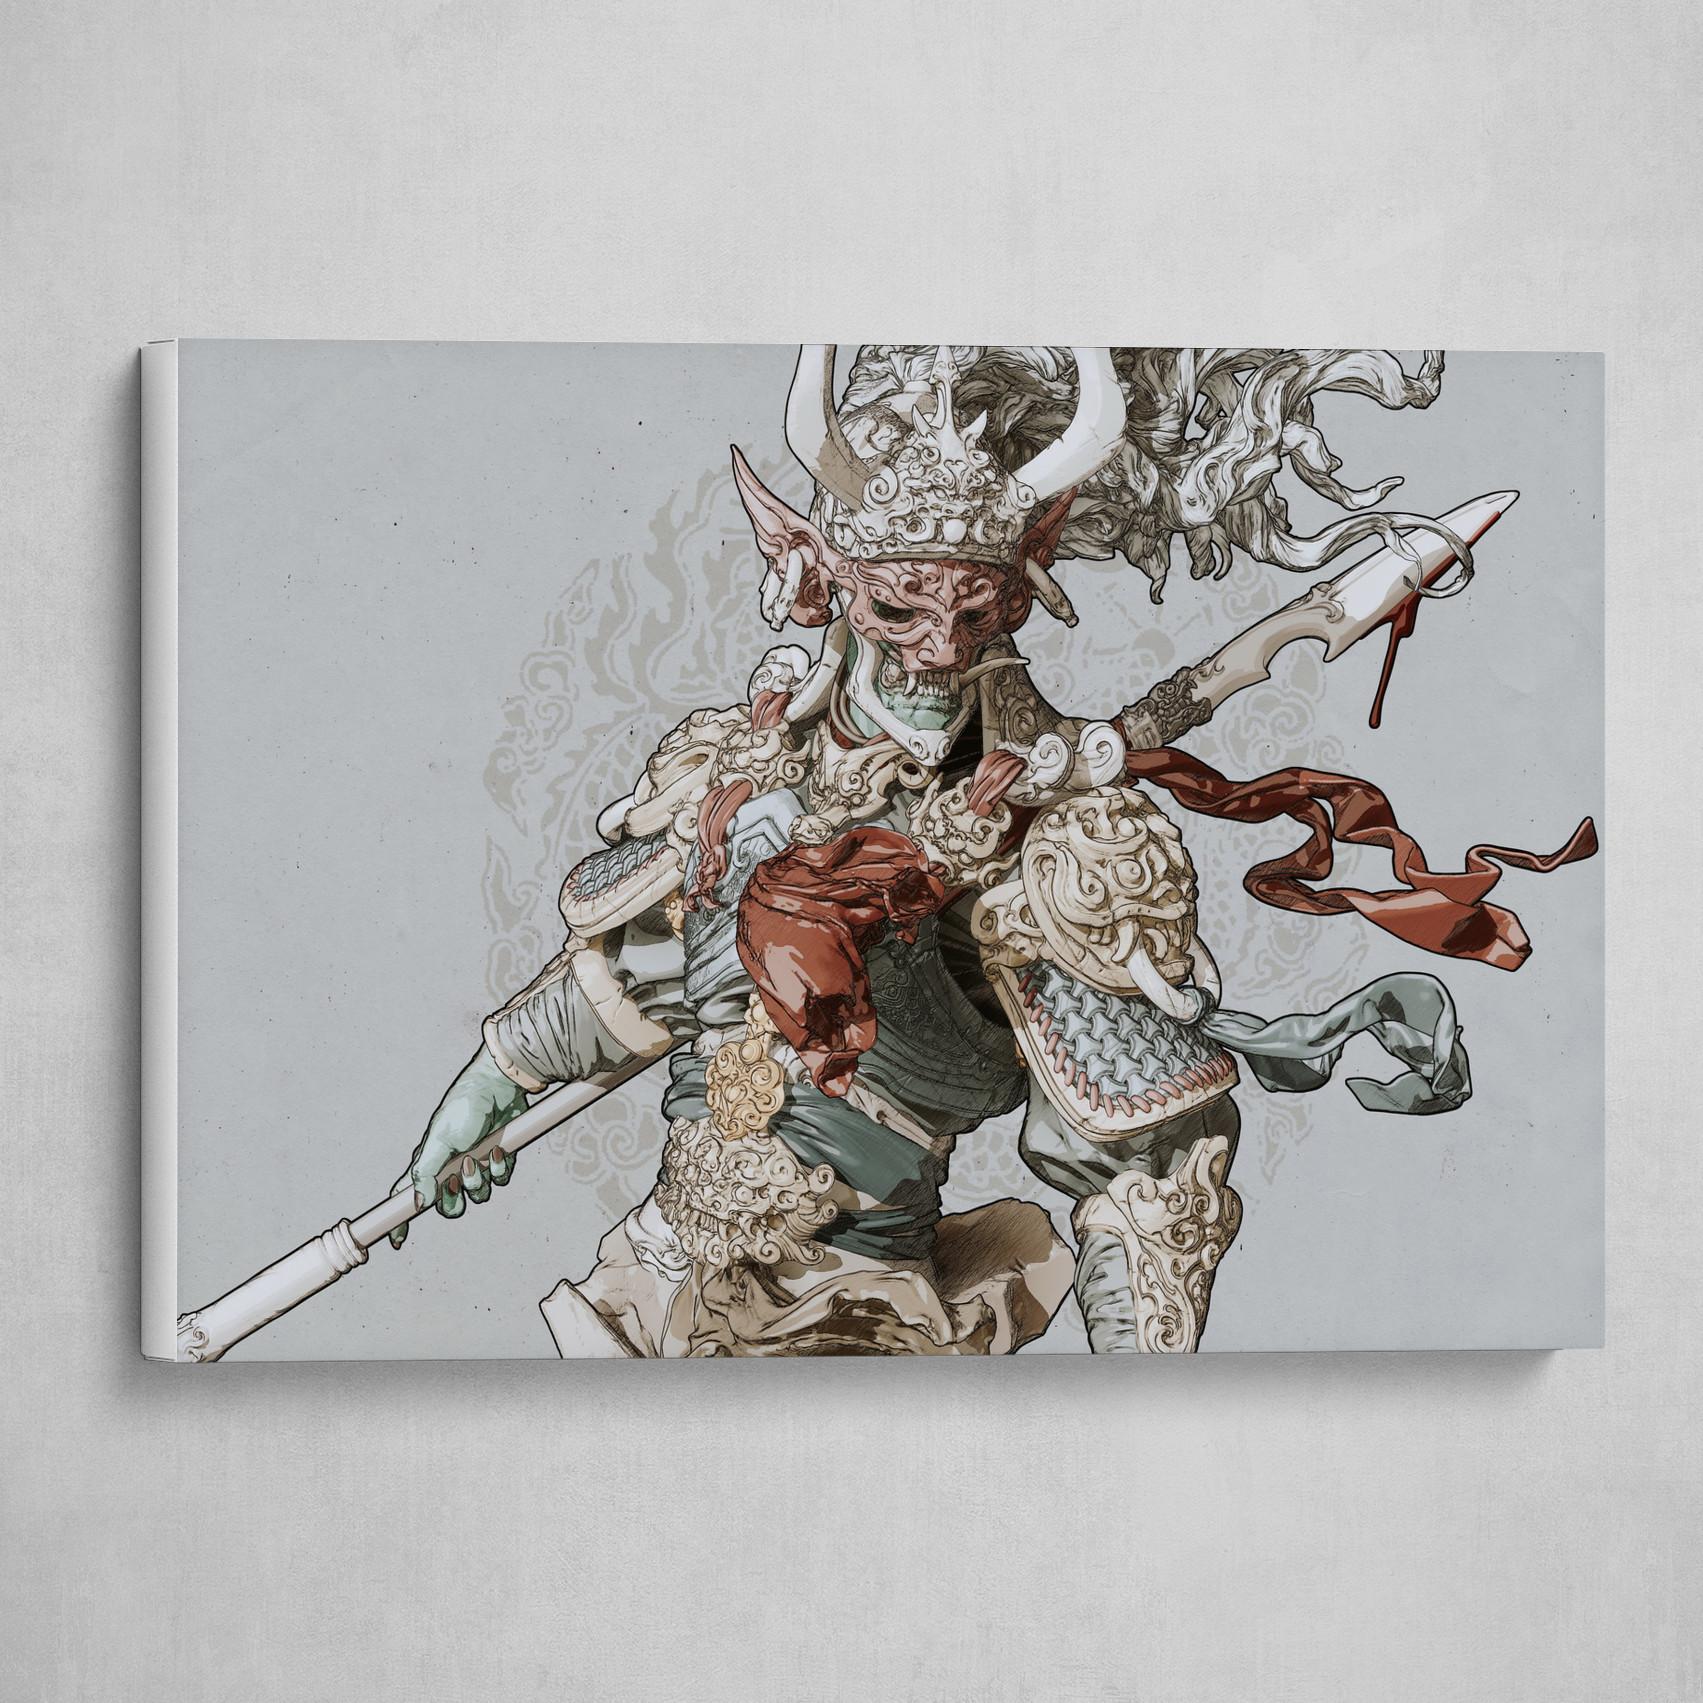 Warrior(Landscape1)